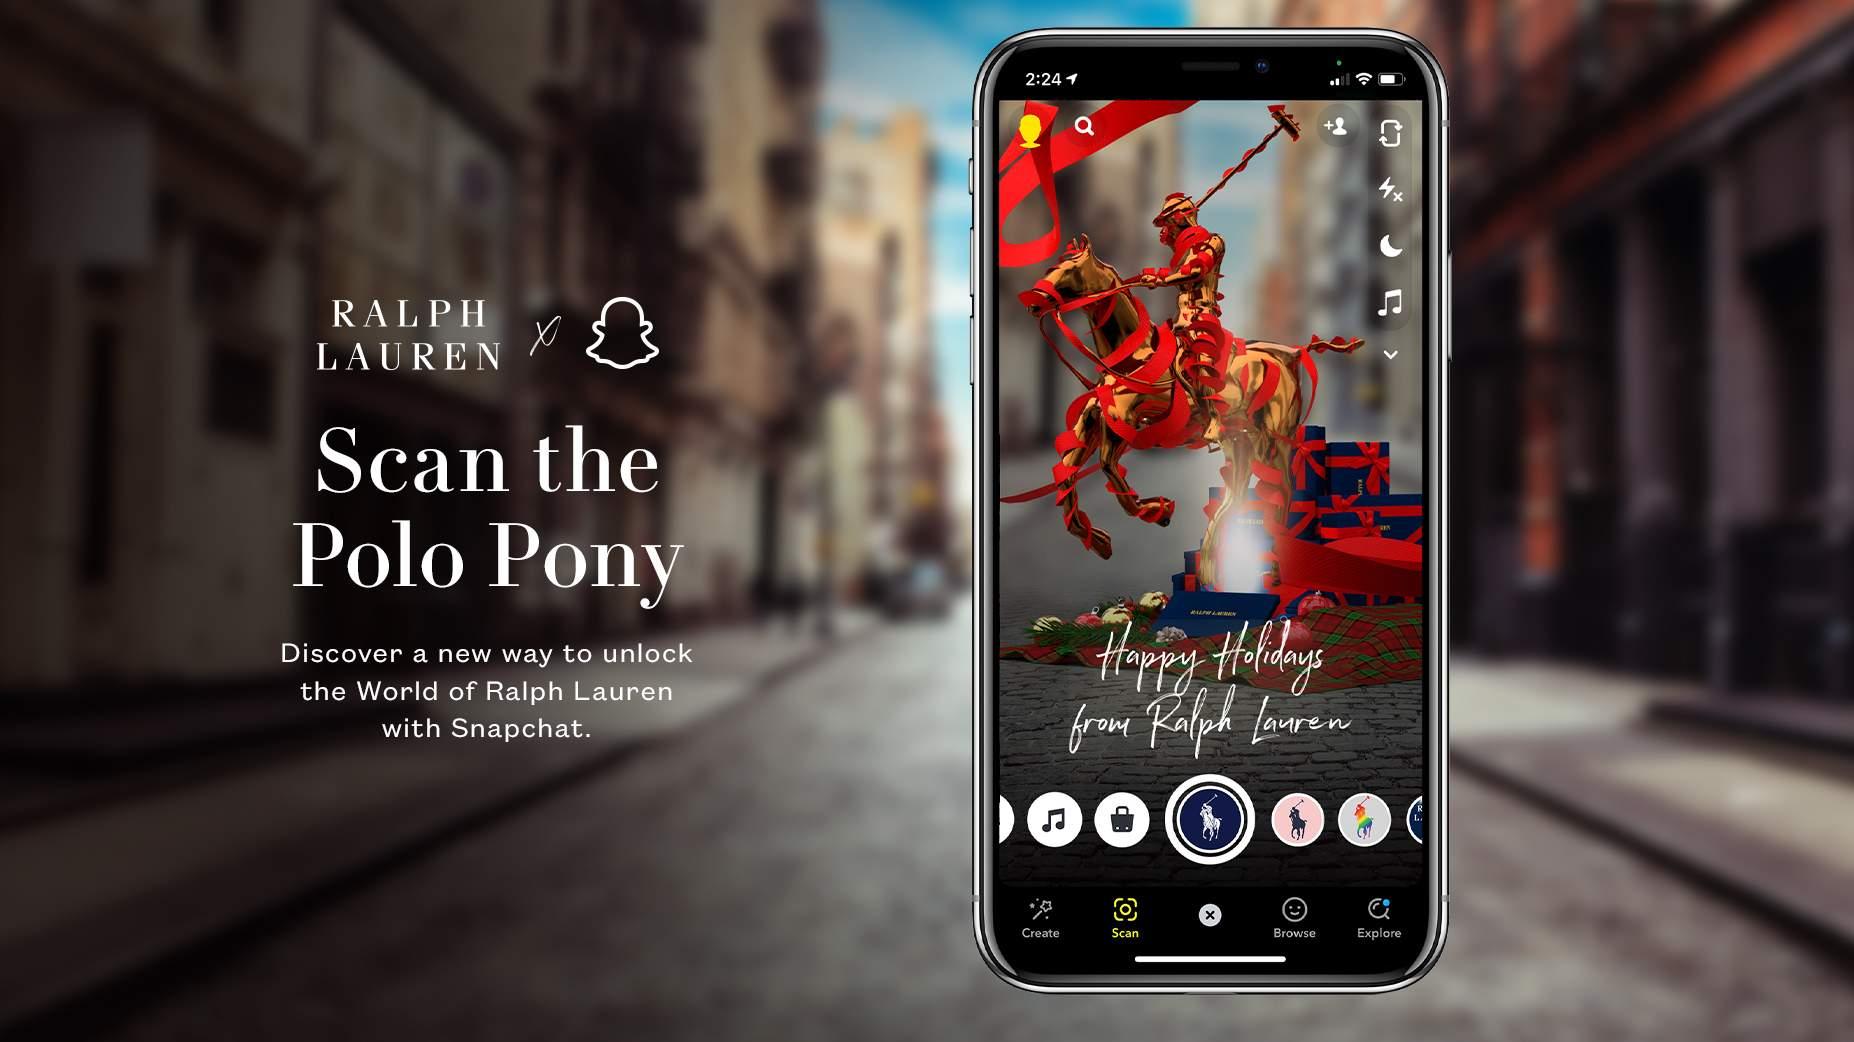 Snapchat, RalpAh Lauren e la realtà aumentata